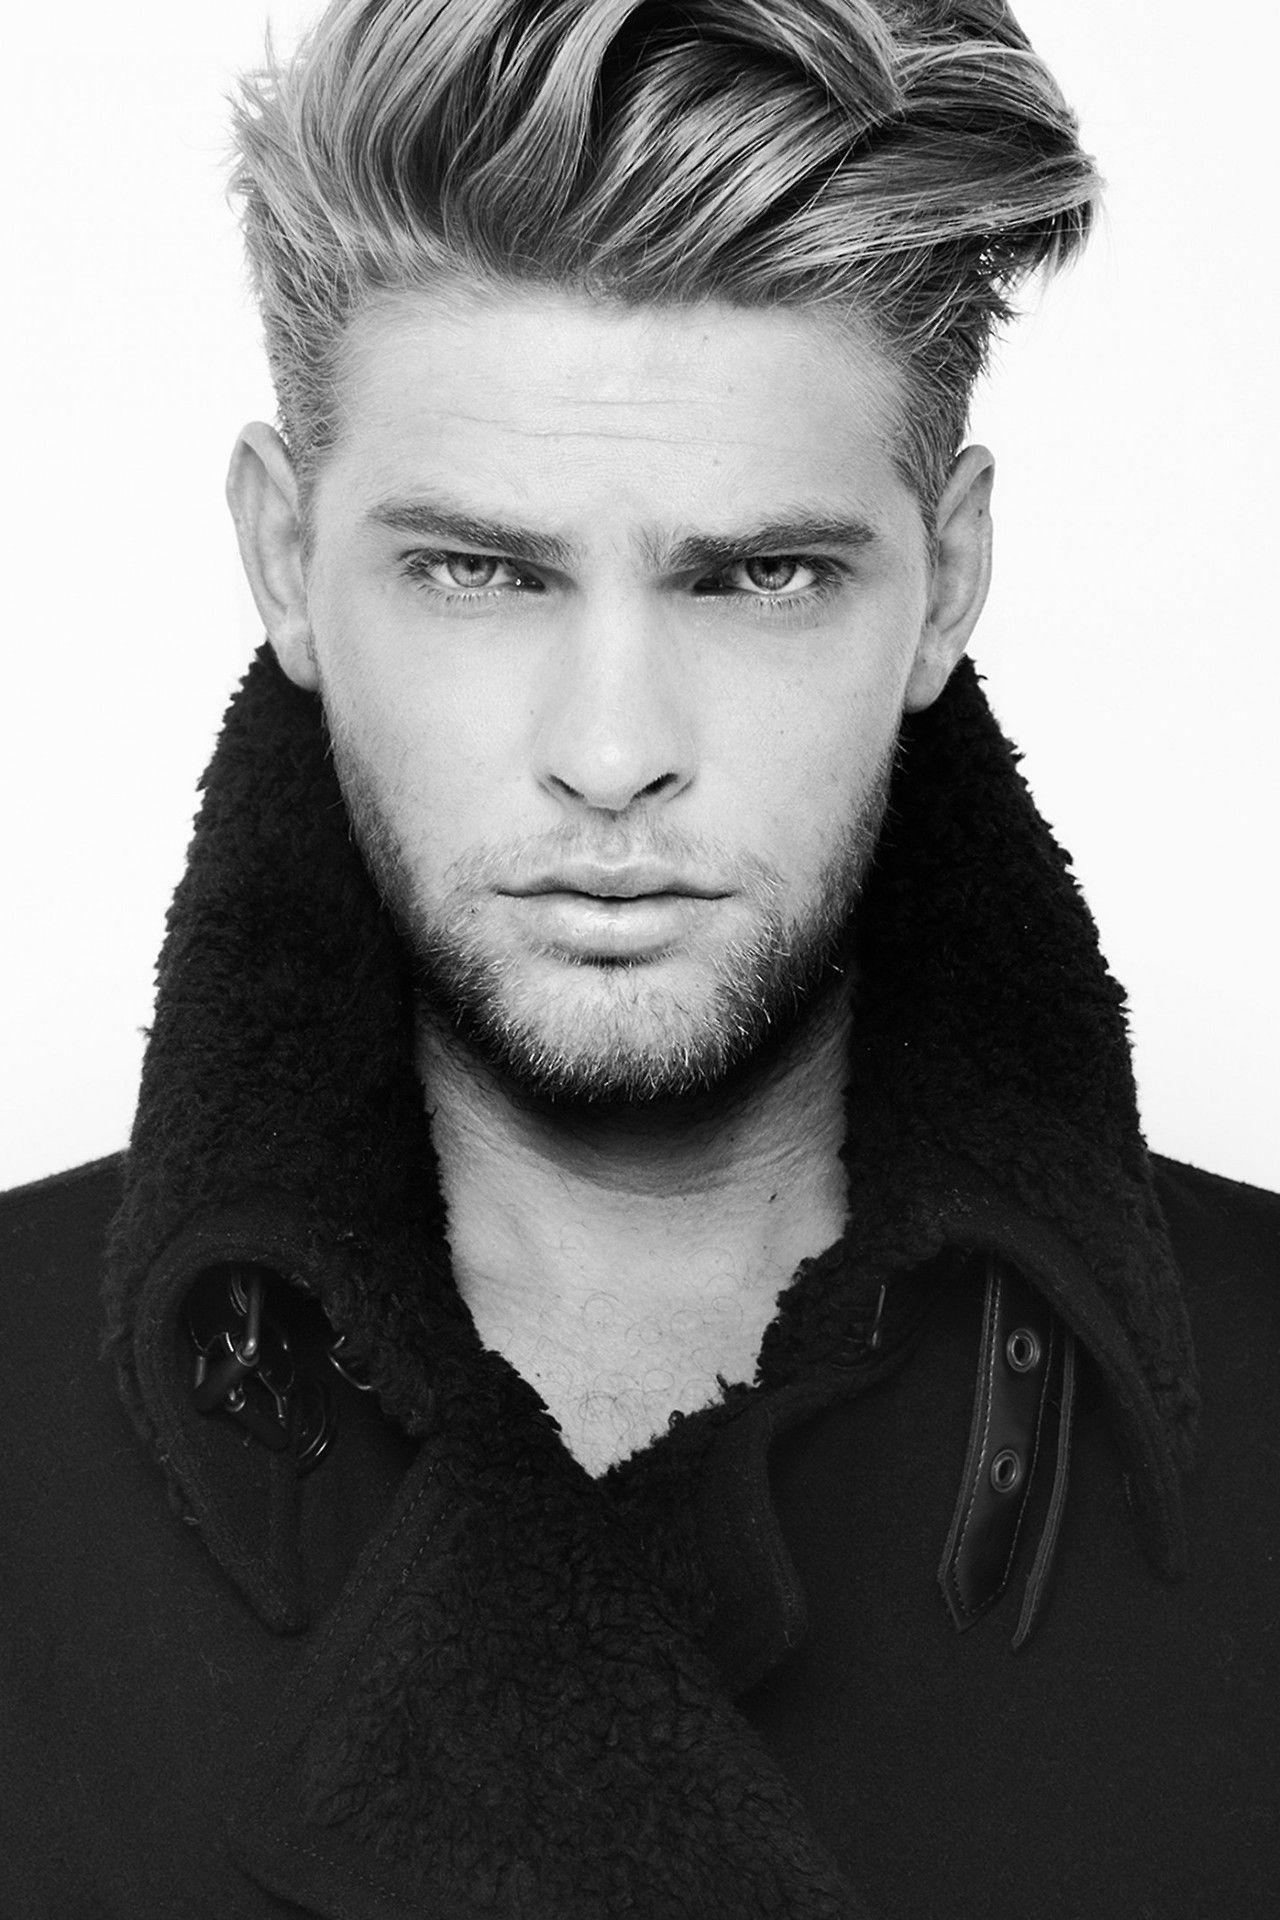 Handsome Males Mias Van Der Westhuyzen Men Haircut Styles Hair And Beard Styles Mens Hairstyles